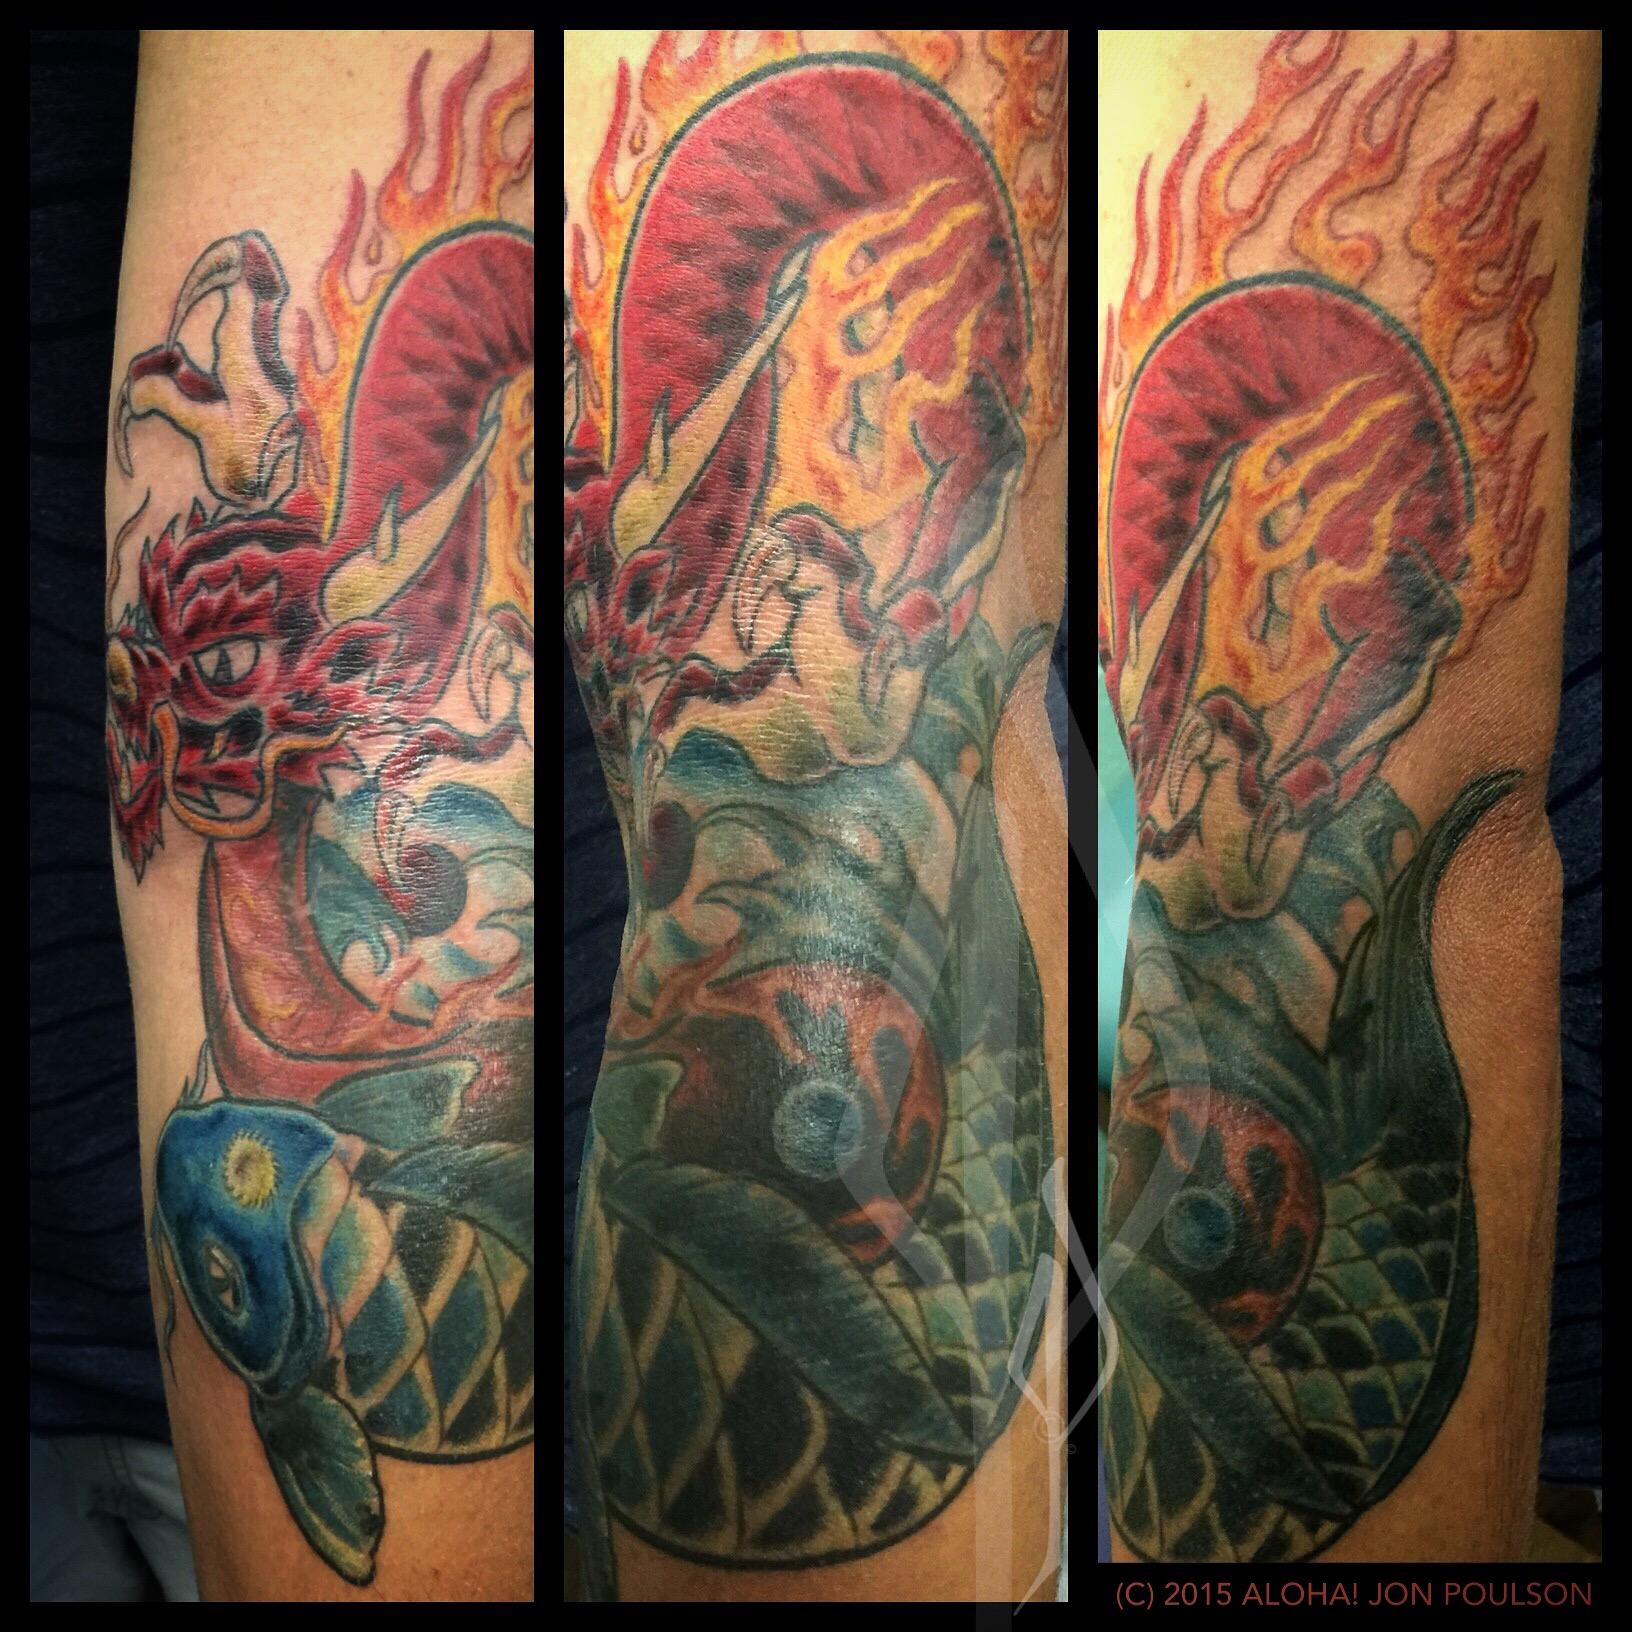 Asain Dragon and Koi Yin-Yang tattoo by Jon Poulson @alohasaltlake www.alohasaltlake.com